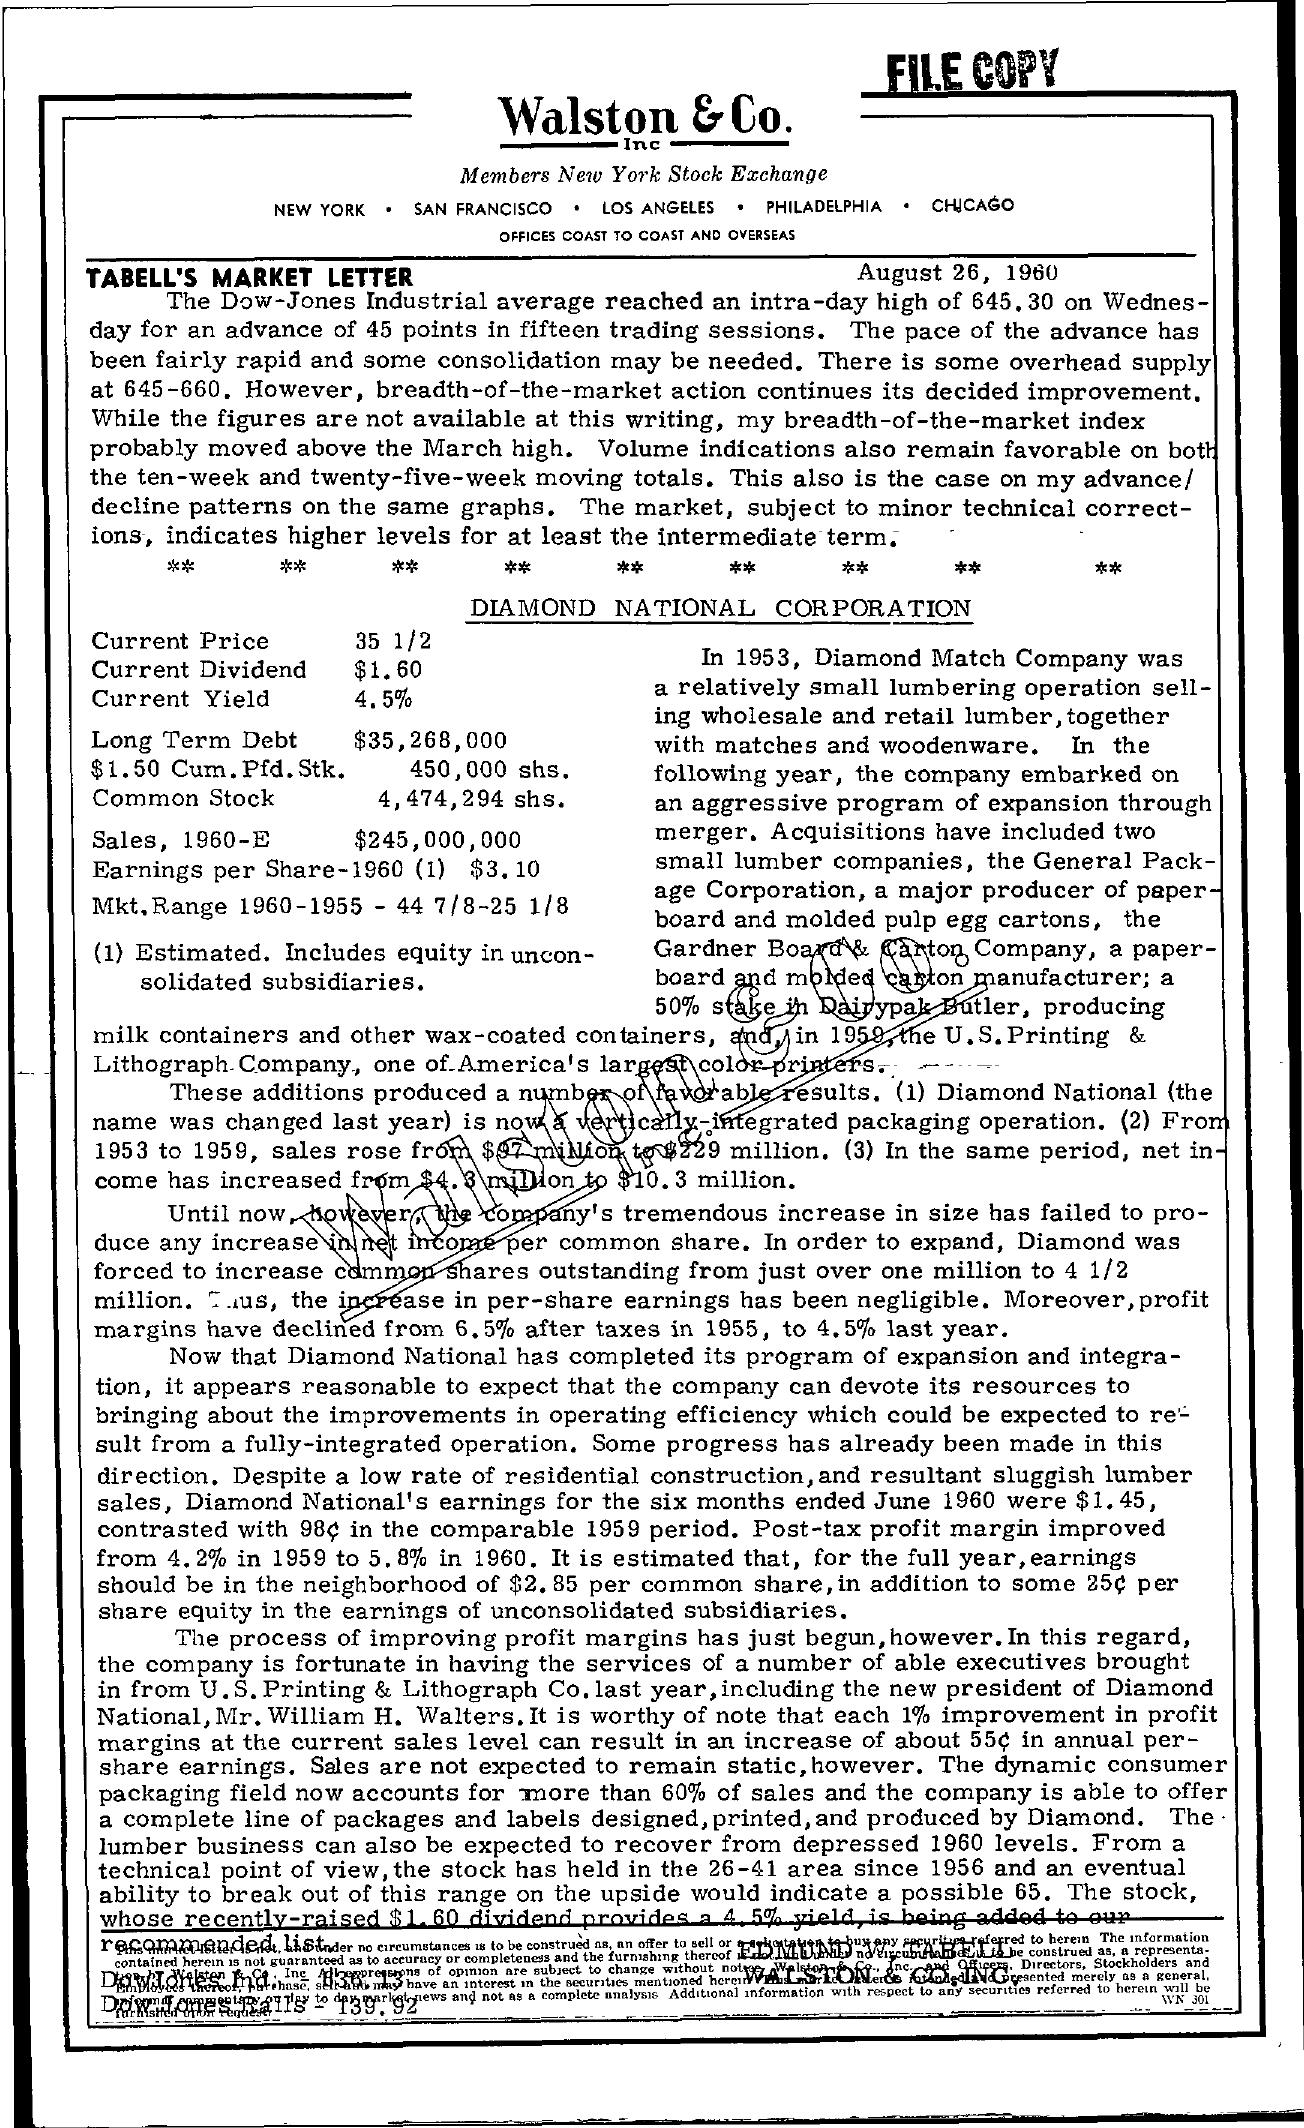 Tabell's Market Letter - August 26, 1960